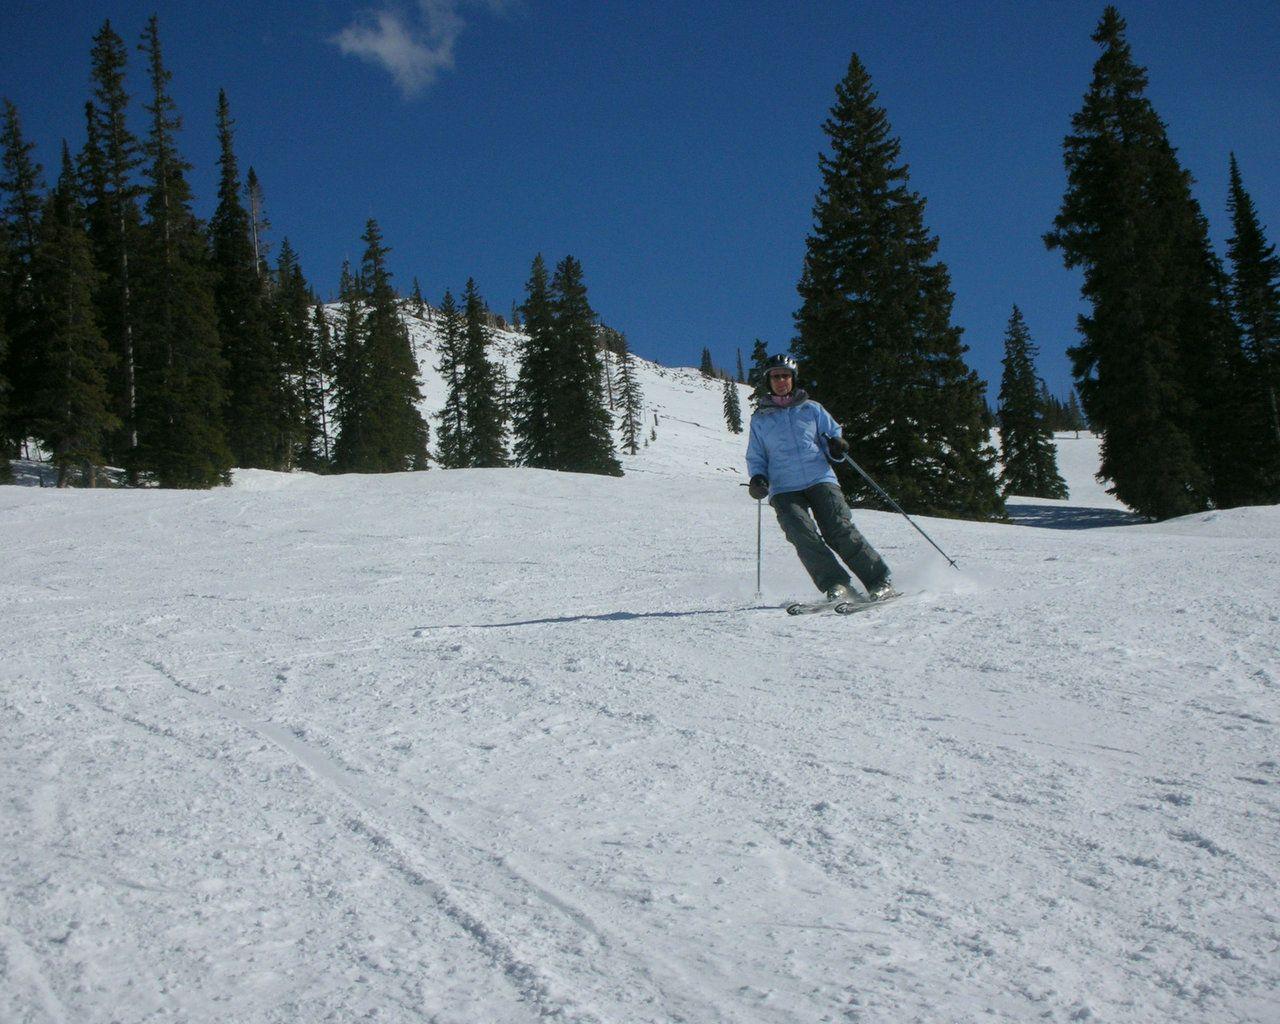 World's best skiing for intermediates? New adrenalin pumpers added: www.silvertraveladvisor.com